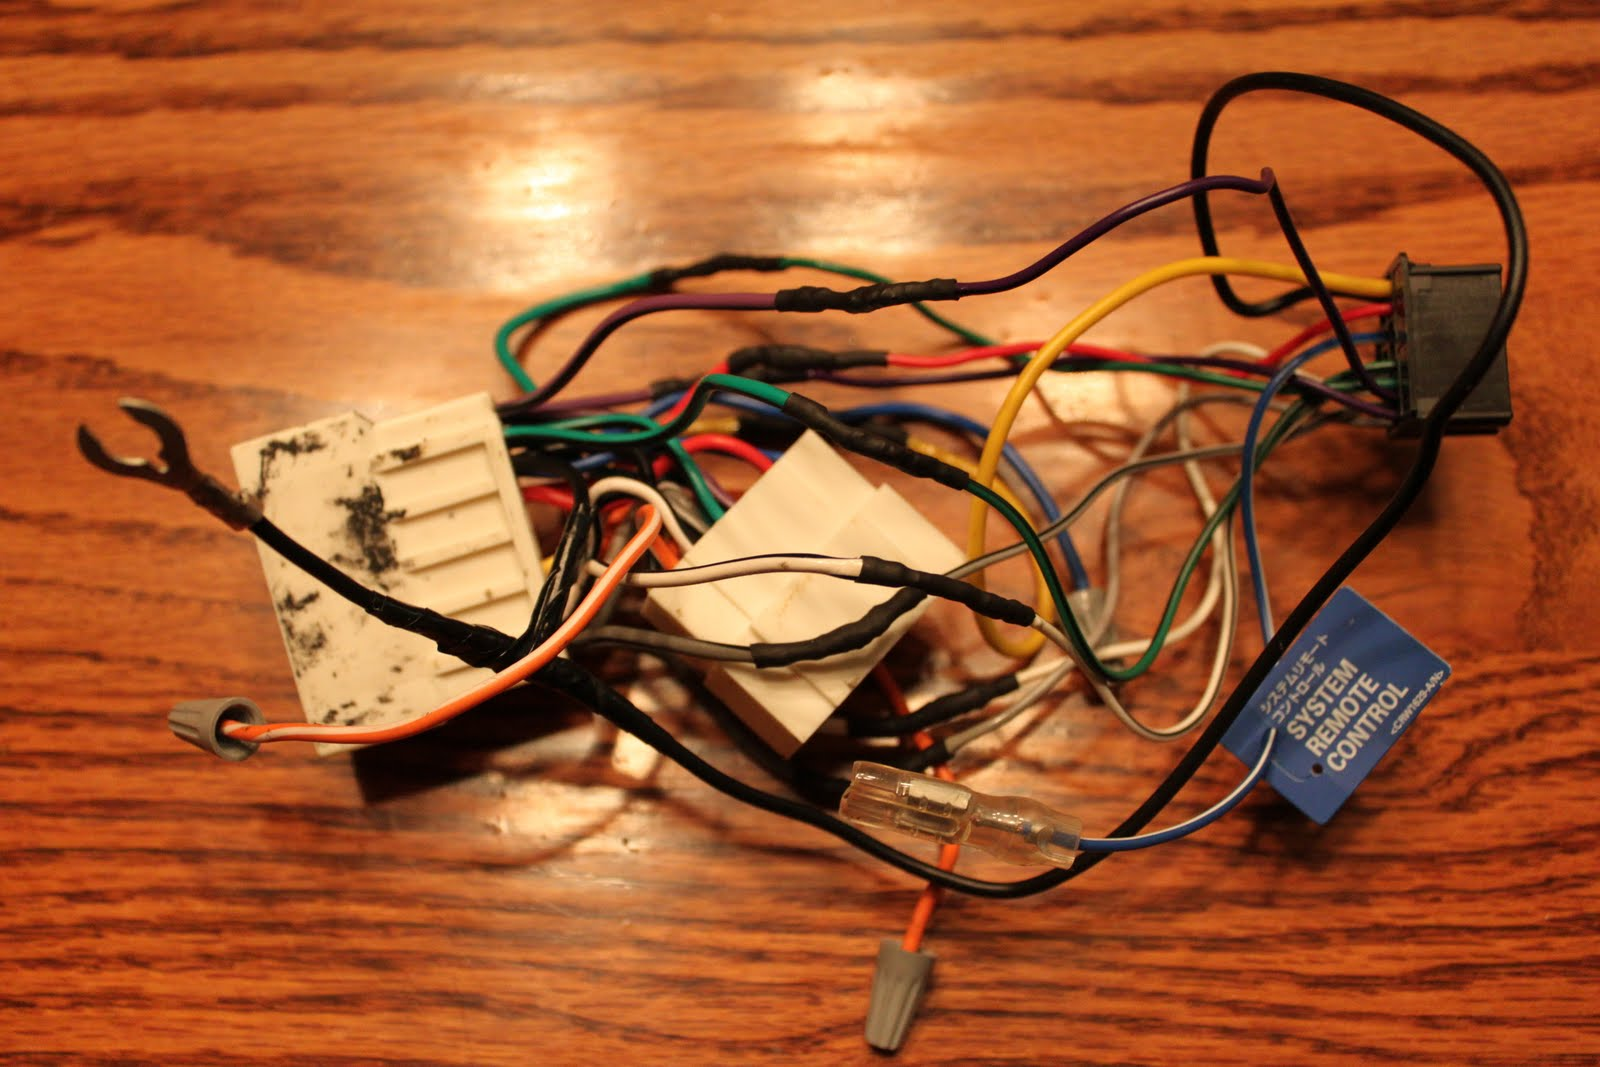 medium resolution of car radio wiring harness solder youtube car wiring harness kits bryan s blog soldering car stereo harness